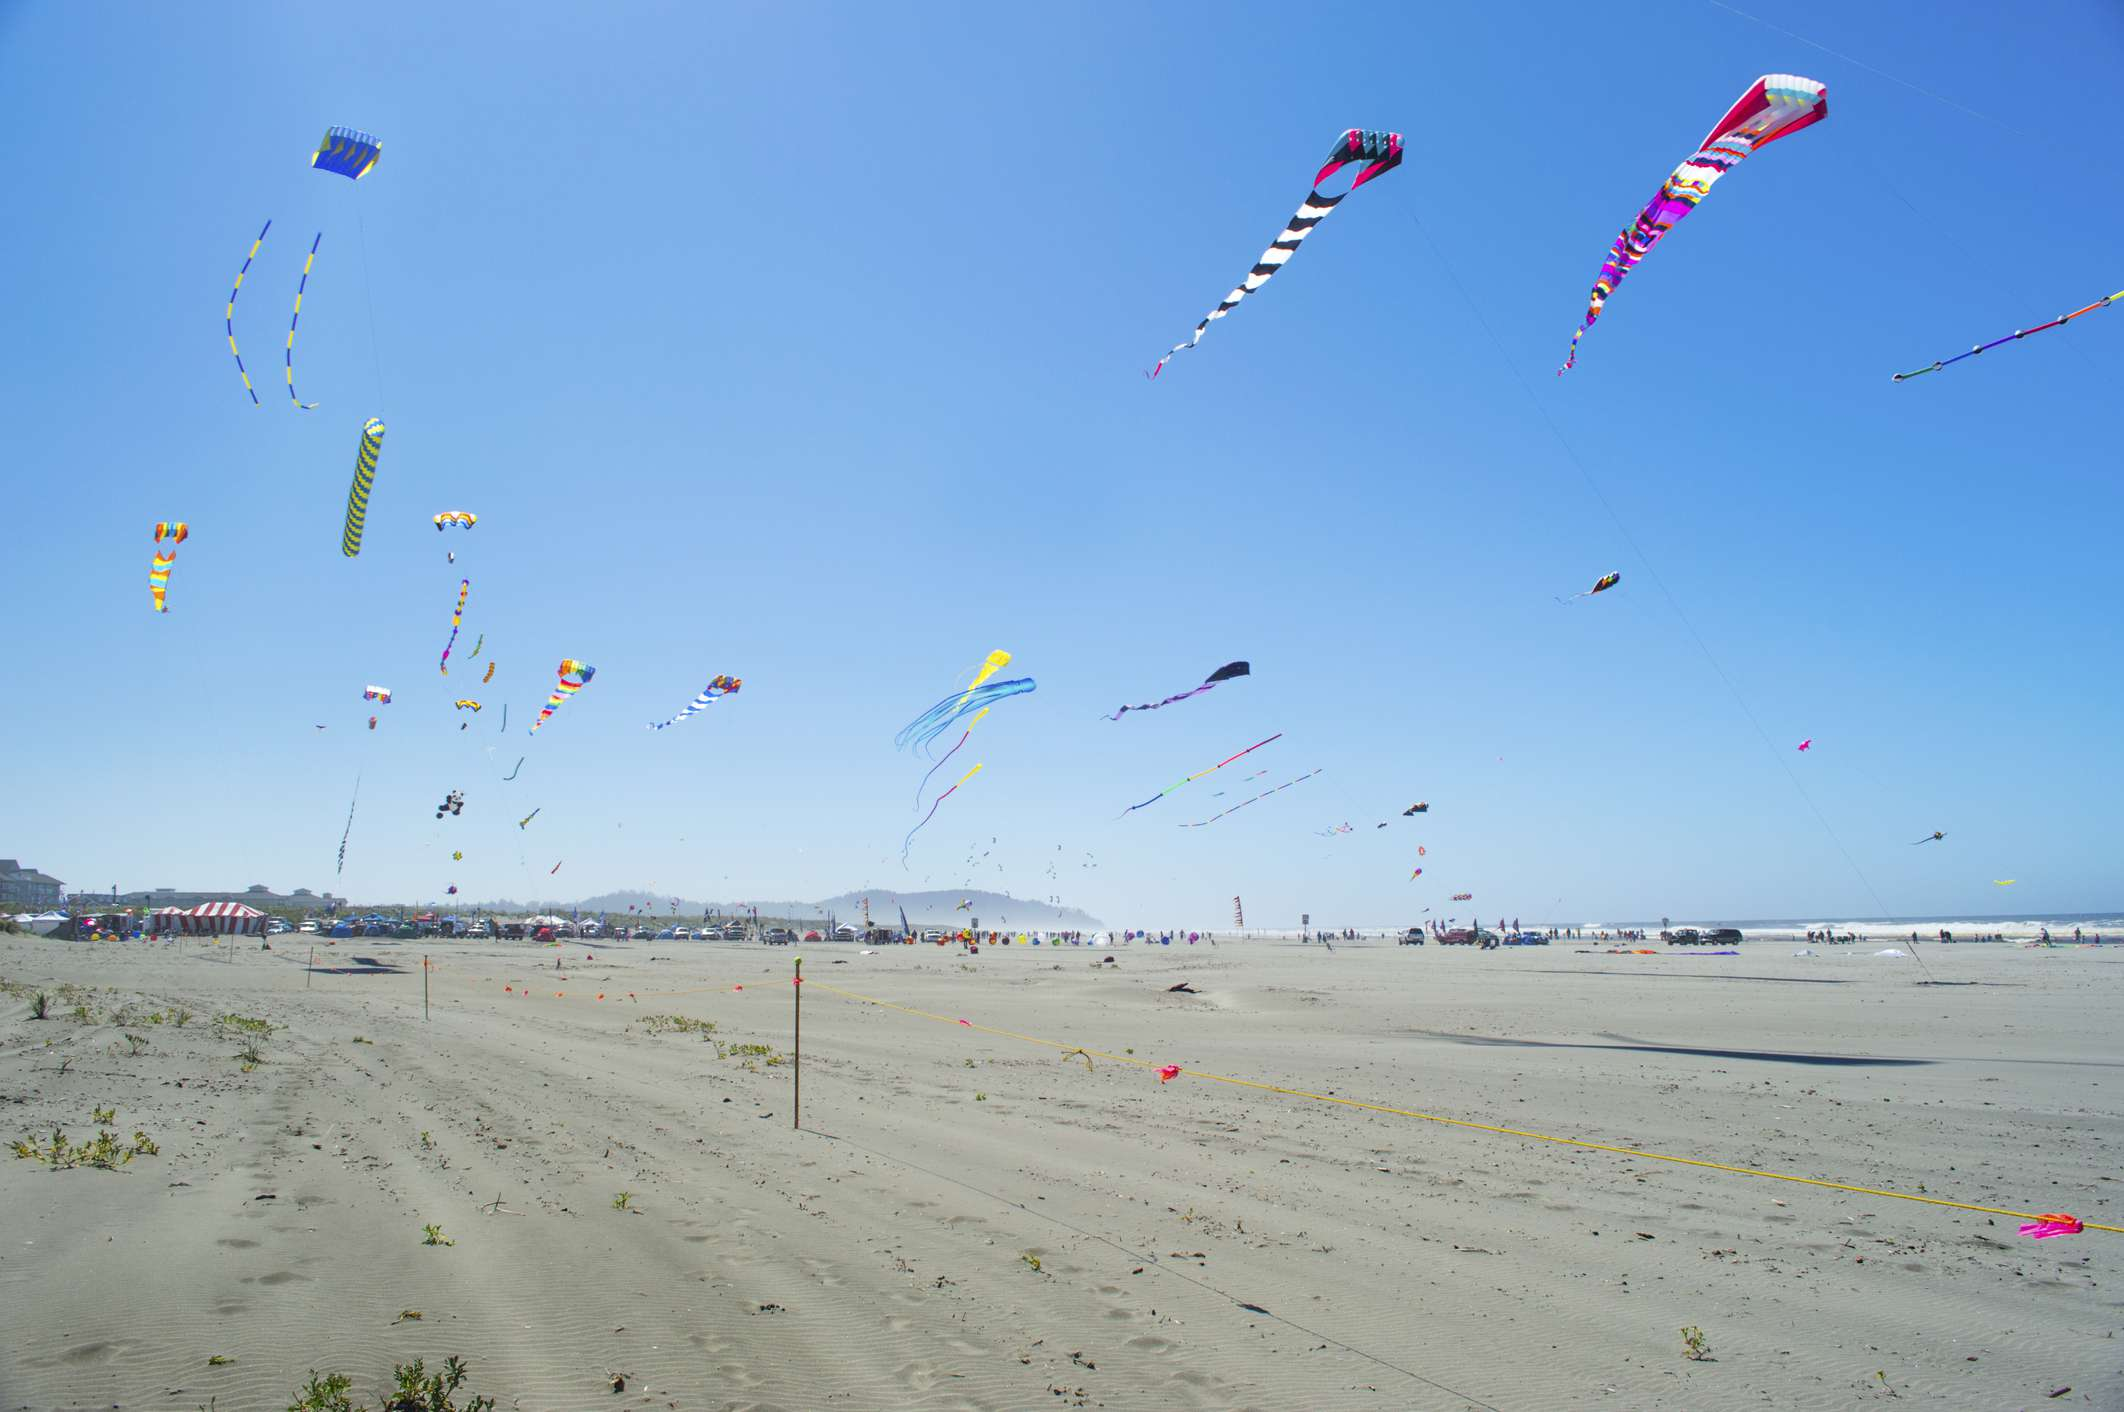 Kites flying on the sky at the Long Beach Kites Festival, WA.